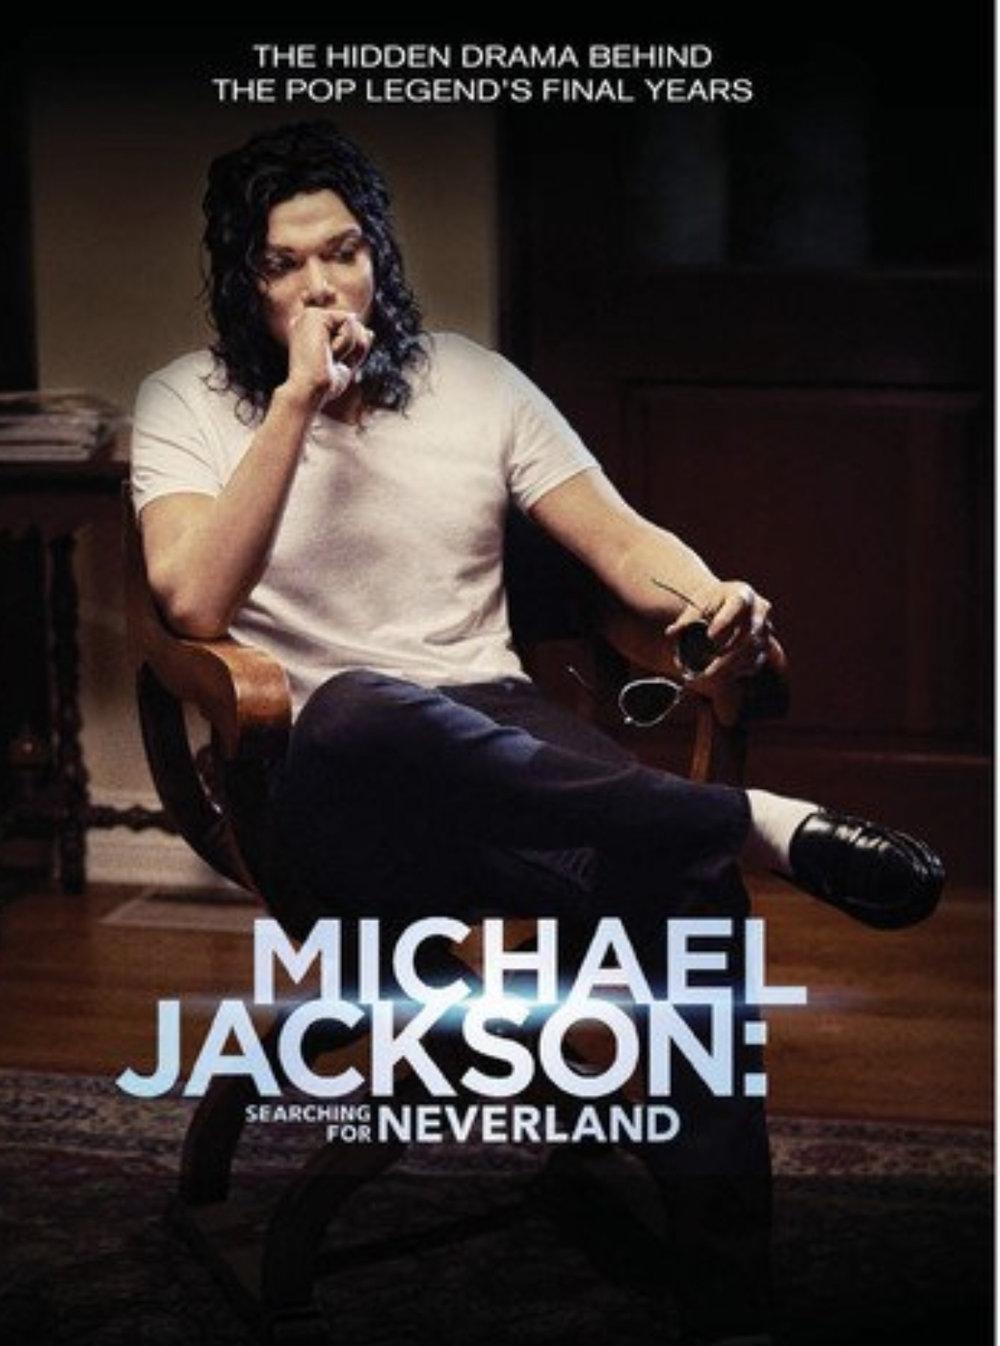 Michael Jackson Movie